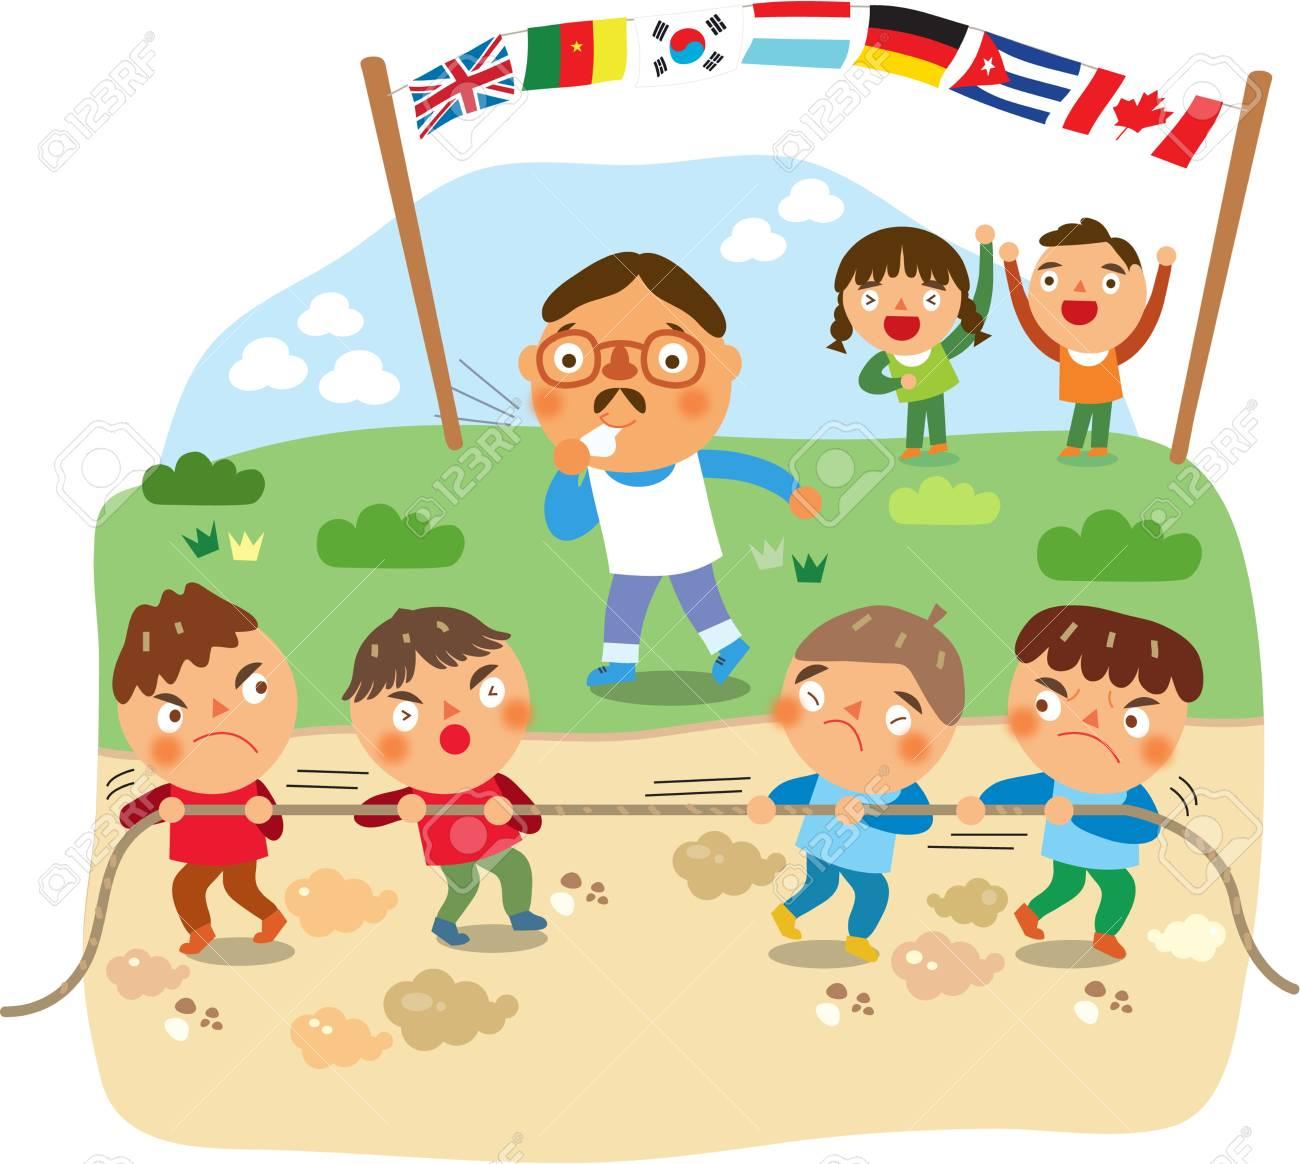 School Children, Children, Clipart, School PNG and Vector with Transparent  Background for Free Download | Clip art school kids, Kids clipart, Cartoon  kids